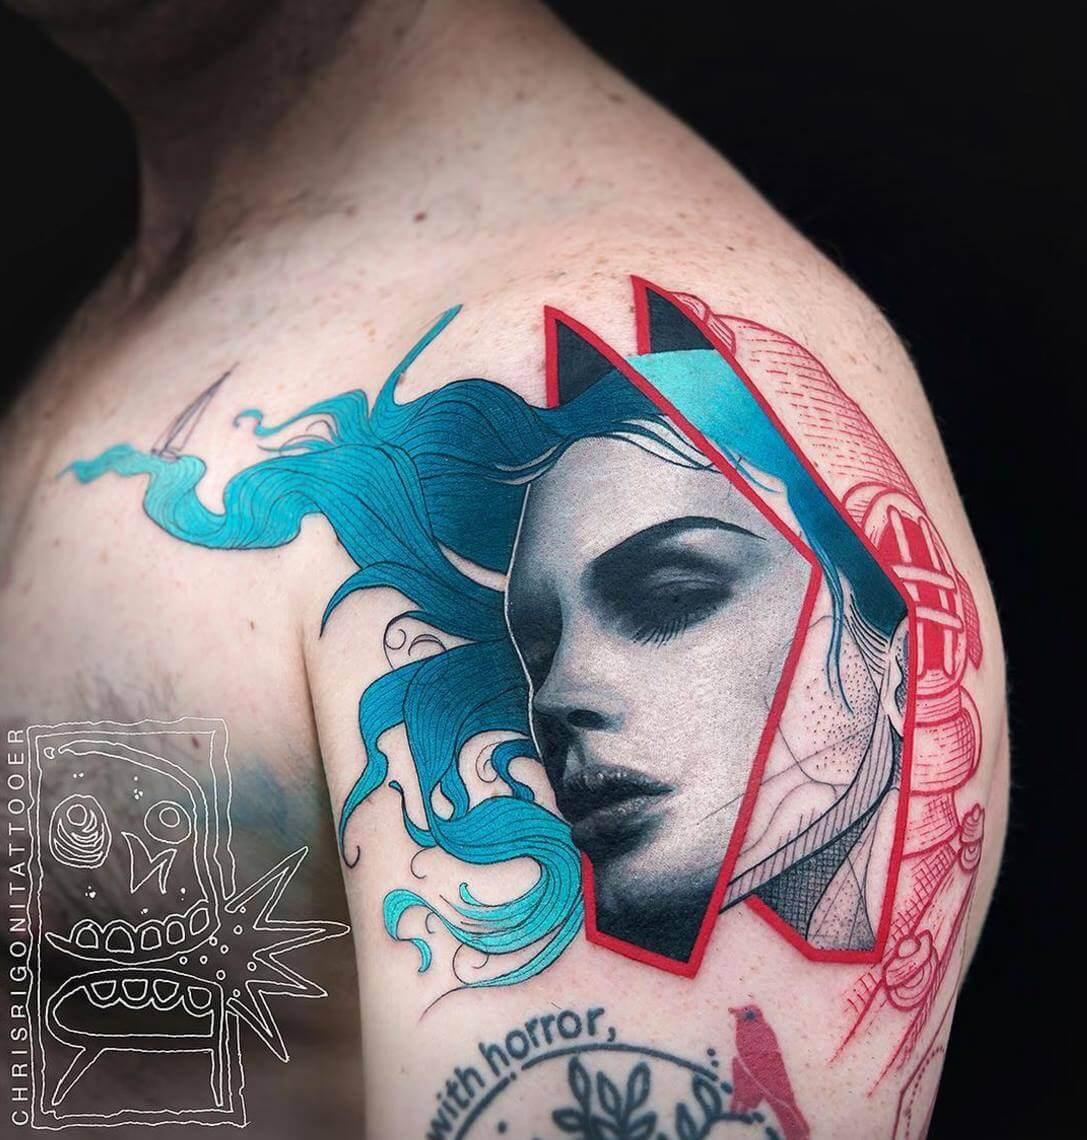 chris rigoni amazing tattoos 7 (1)